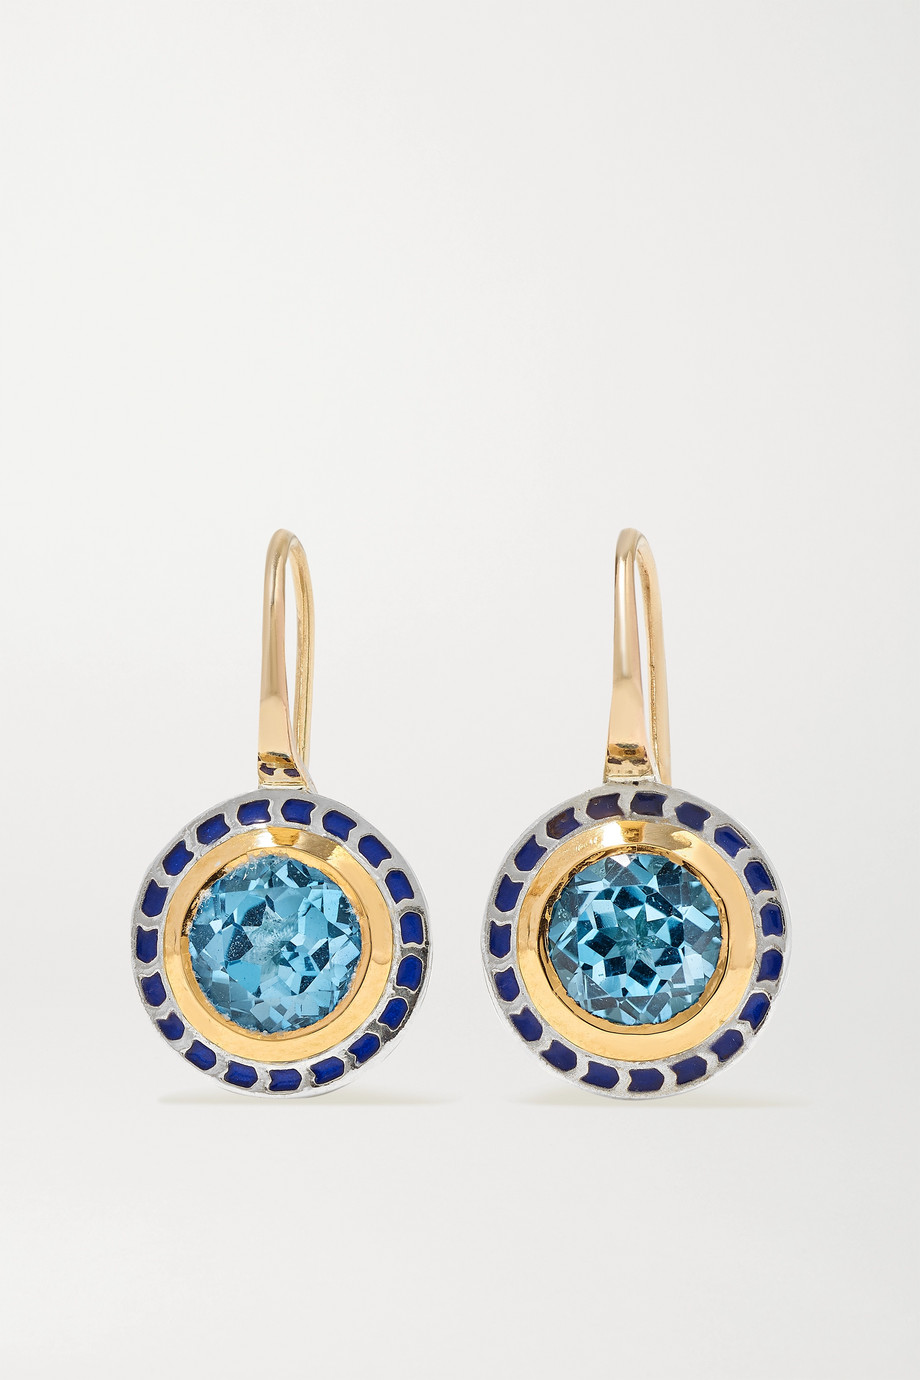 Alice Cicolini Tile Mini sterling silver, 22-karat gold, enamel and topaz earrings